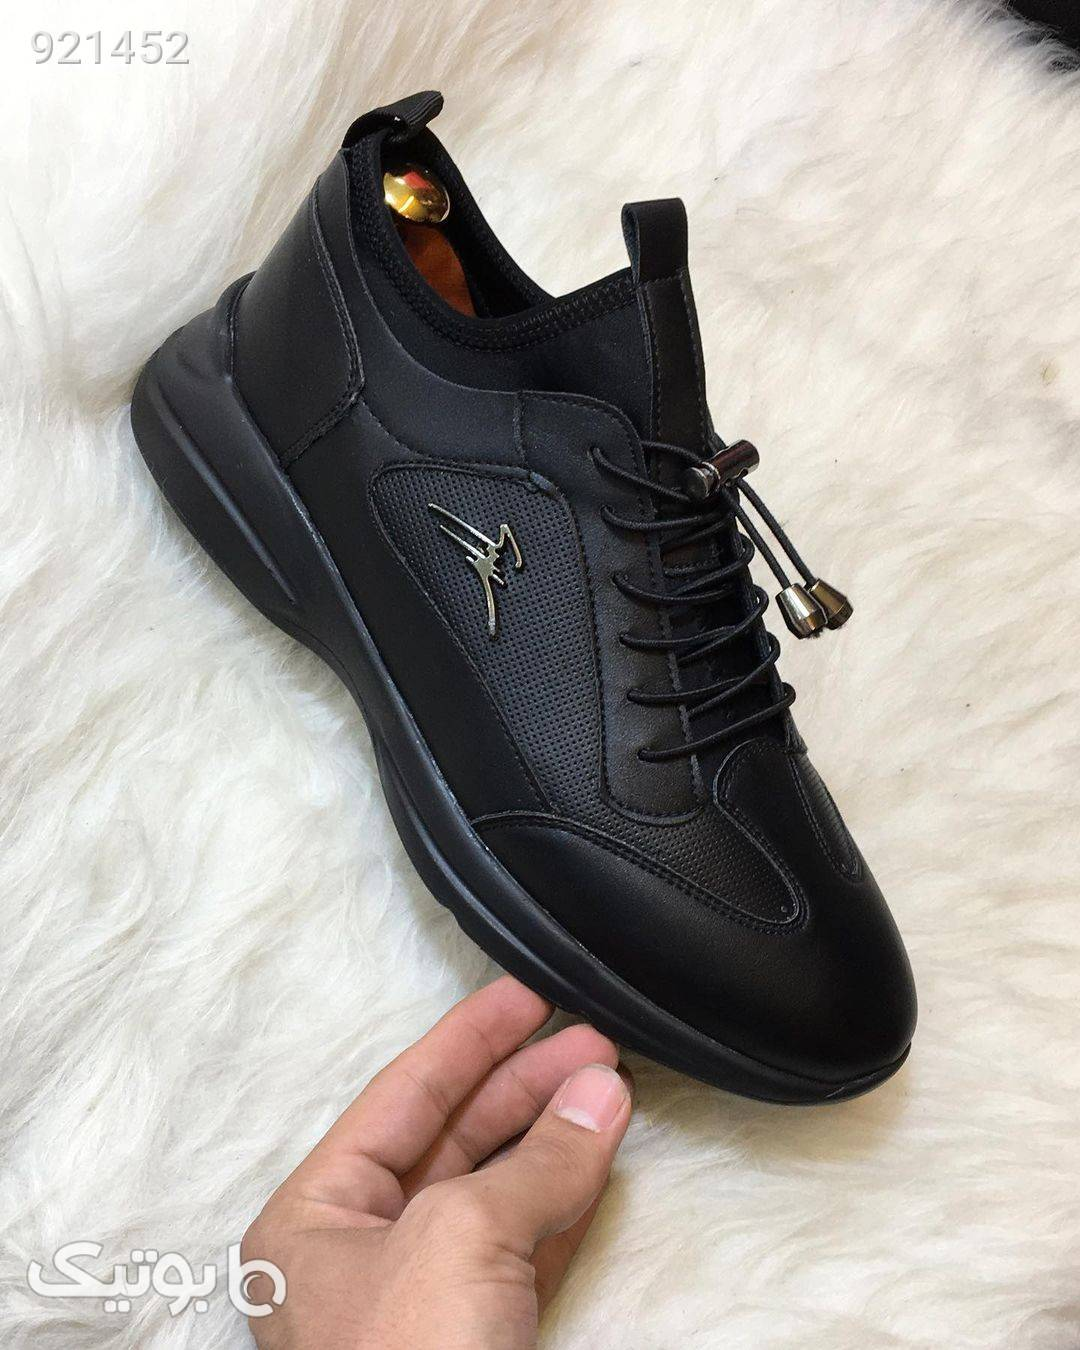 کفش مردانه شیک و جدید مشکی كفش مردانه